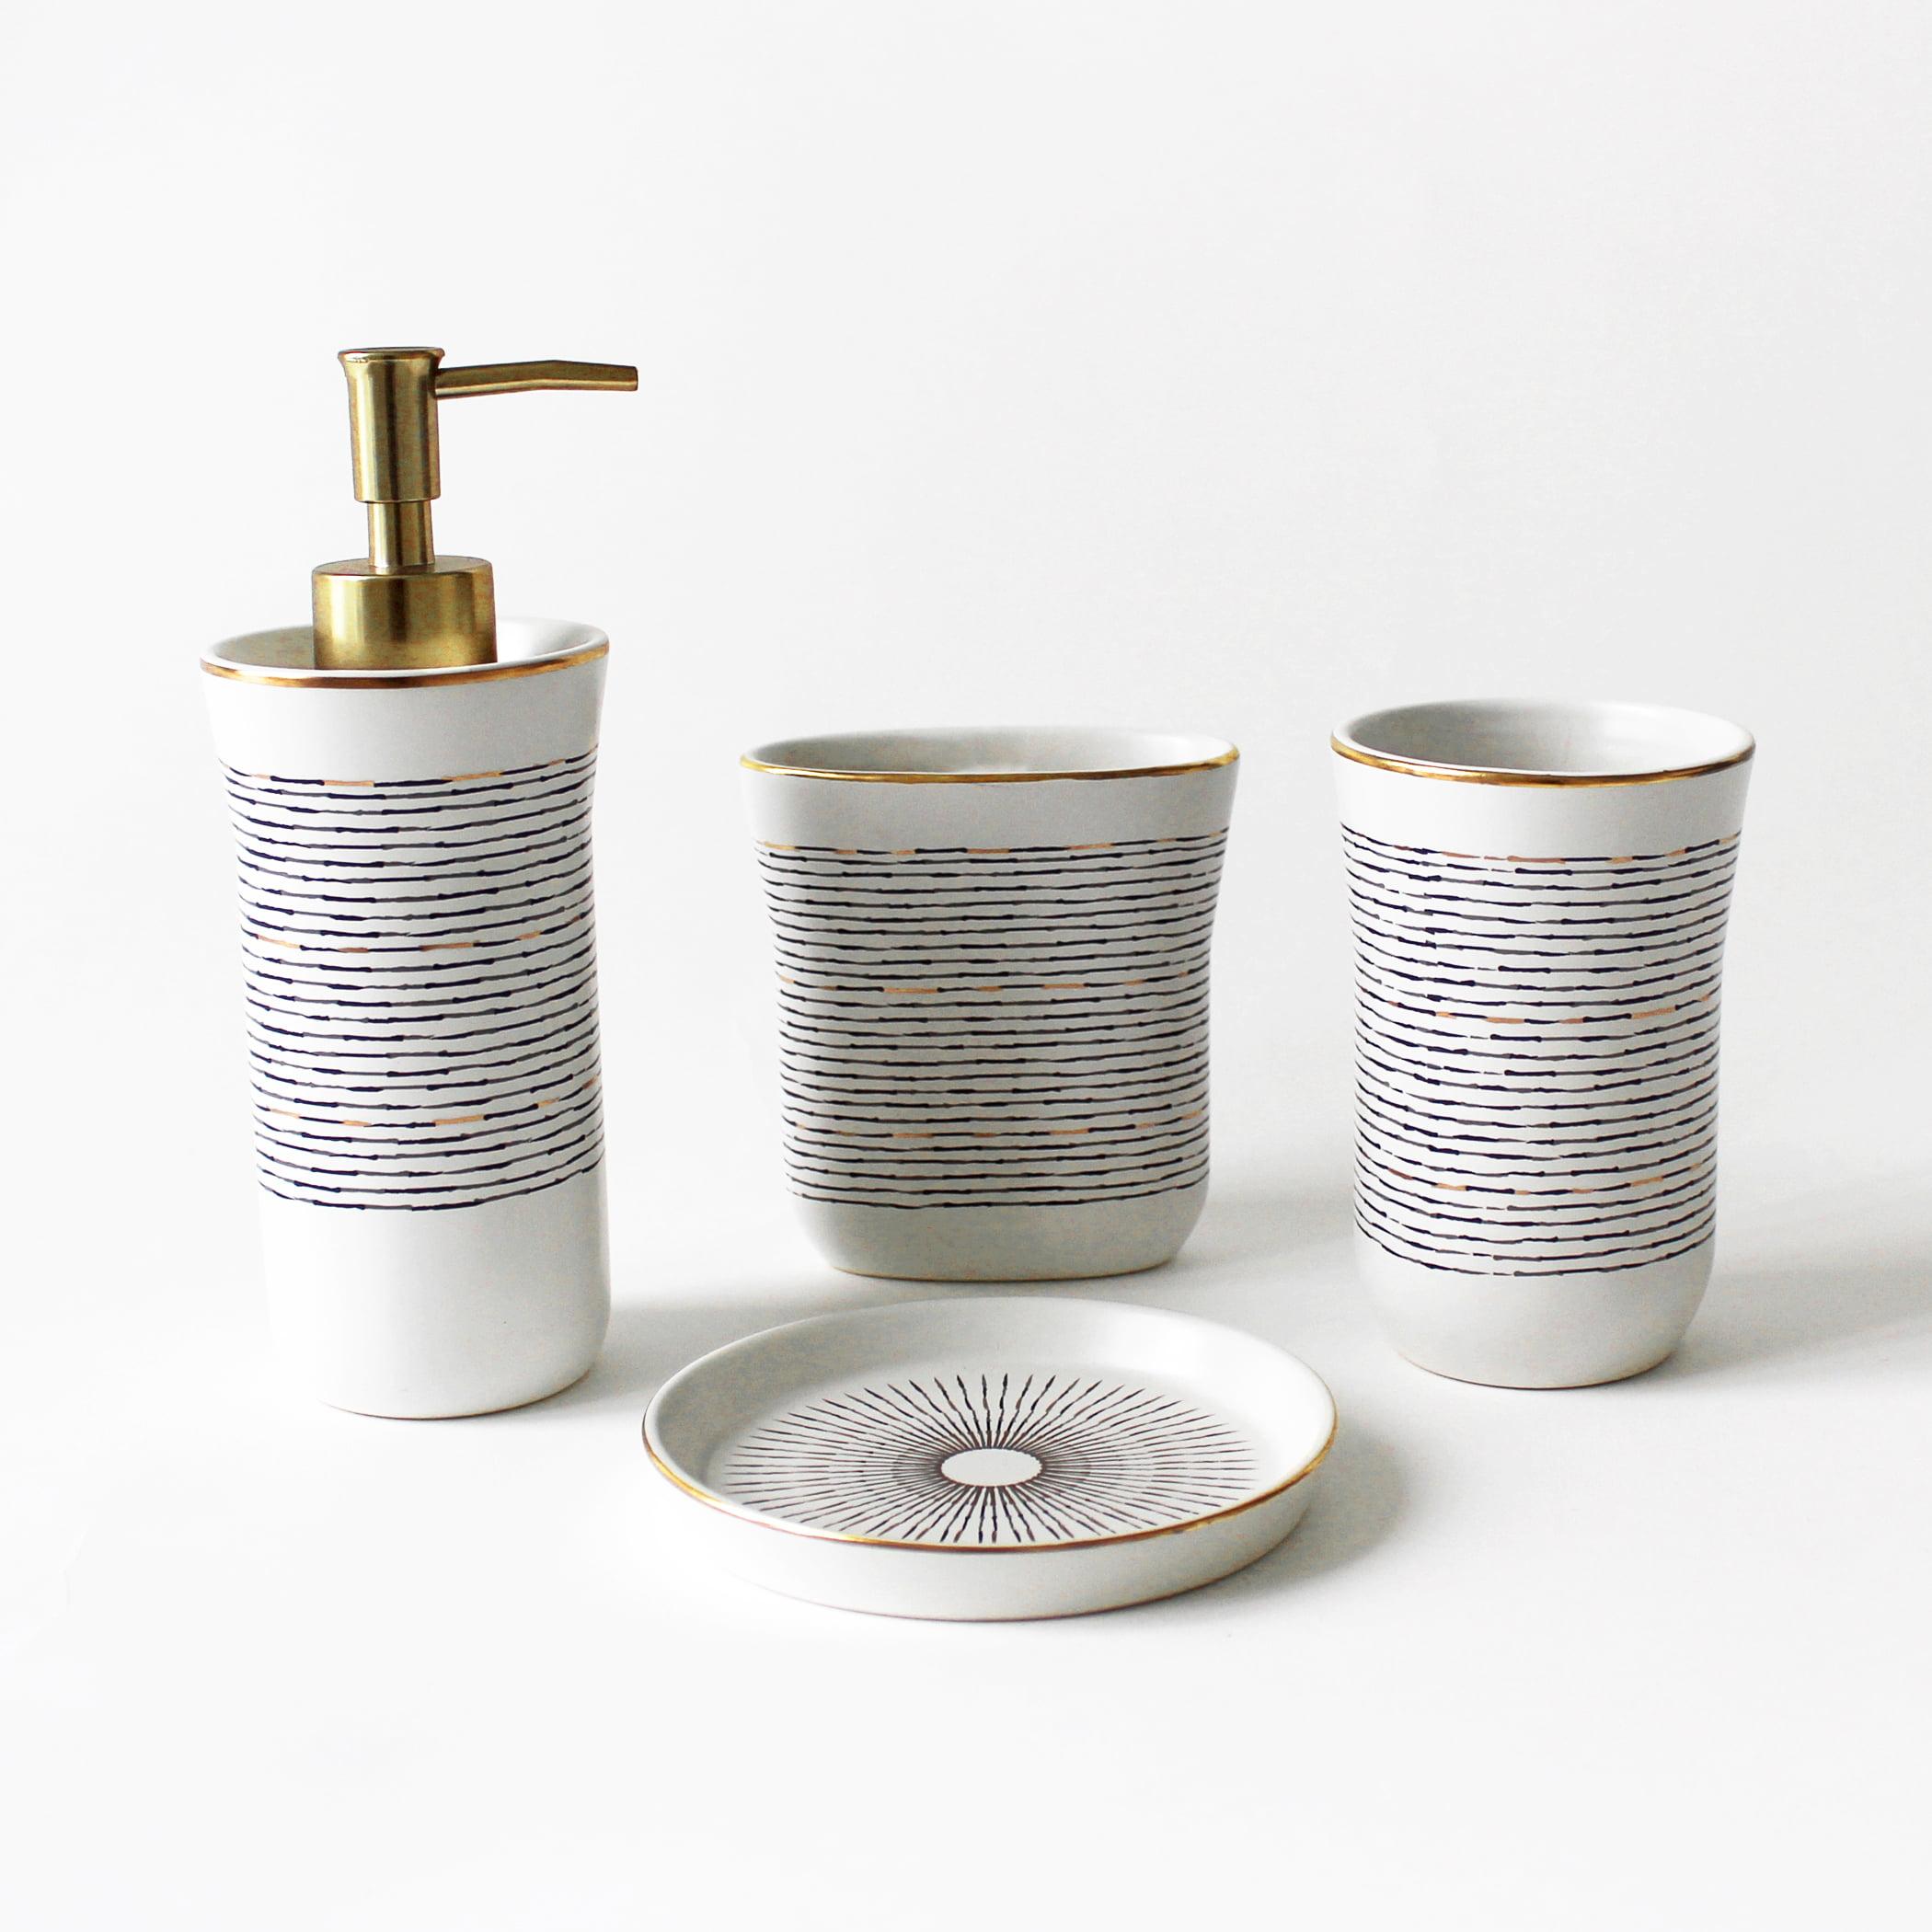 Splash Home 4-Piece Bathroom Ceramic Vanity & Countertop Organizer Set: Tall Soap & Lotion Dispenser, Tumbler, Toothbrush Holder & Soap Dish